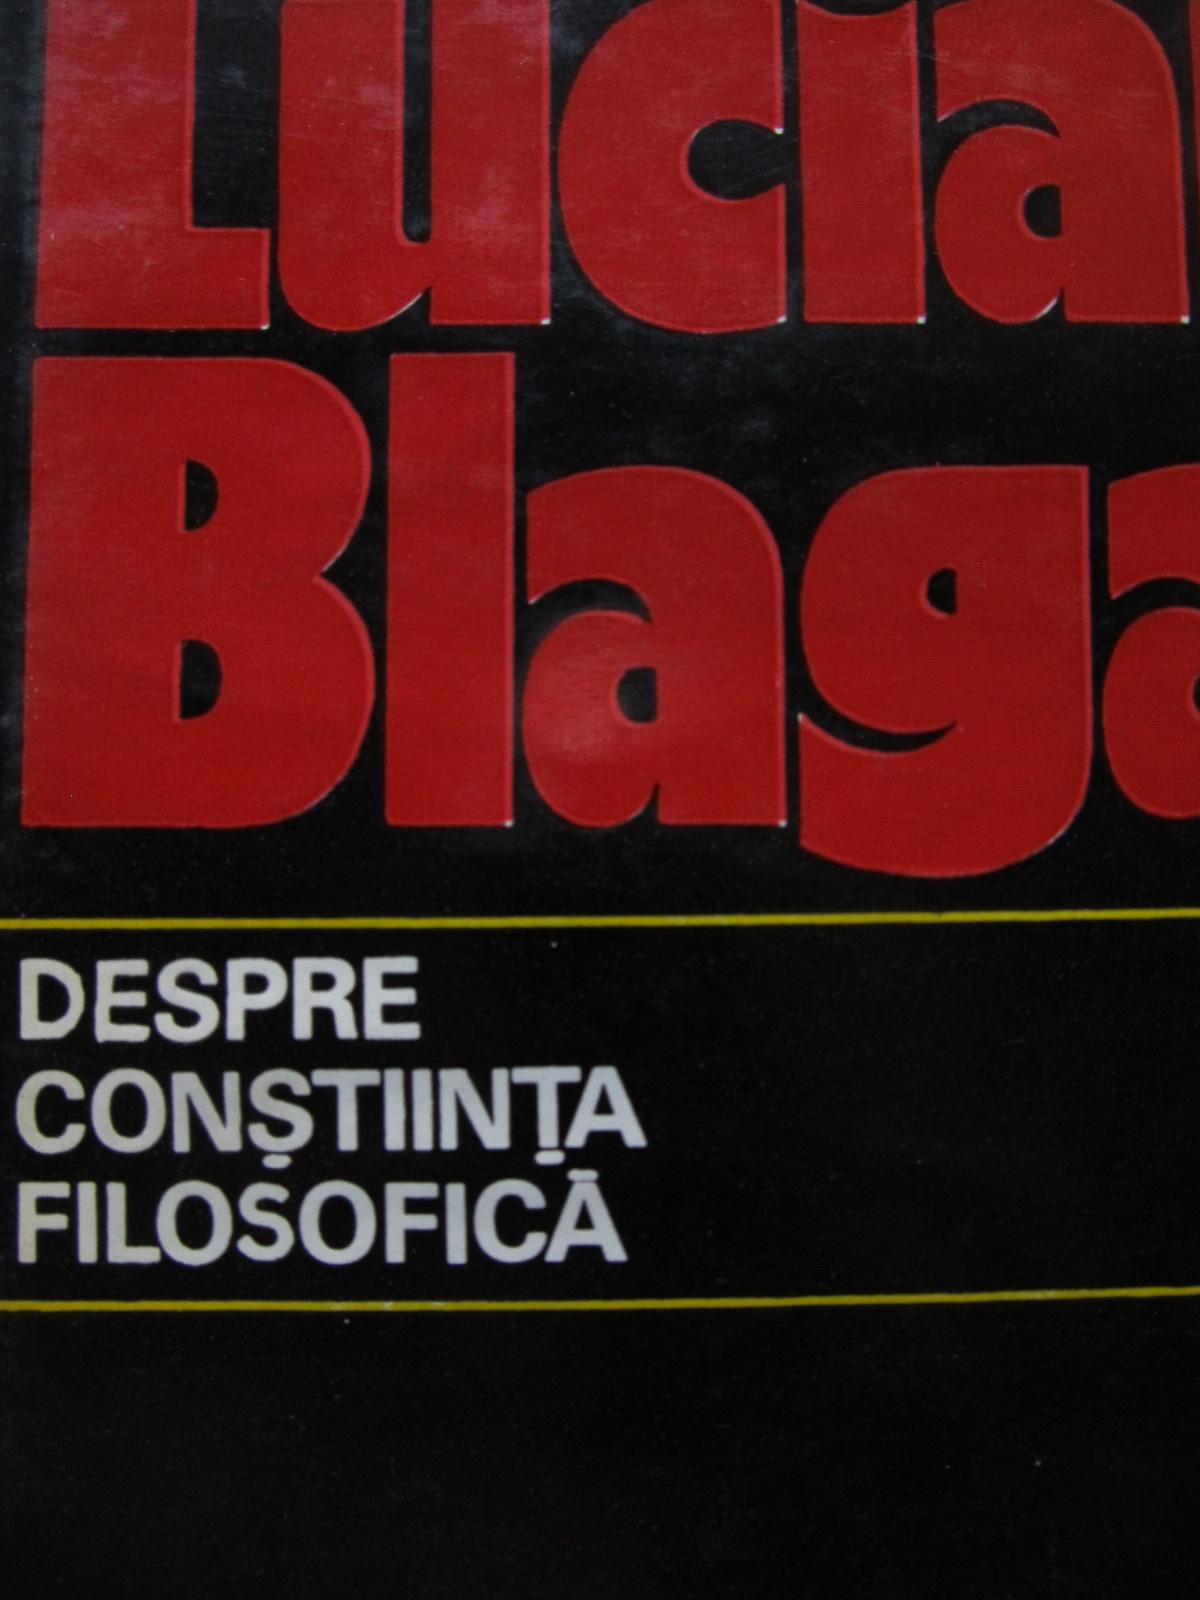 Despre constiinta filosofica [1] - Lucian Blaga   Detalii carte